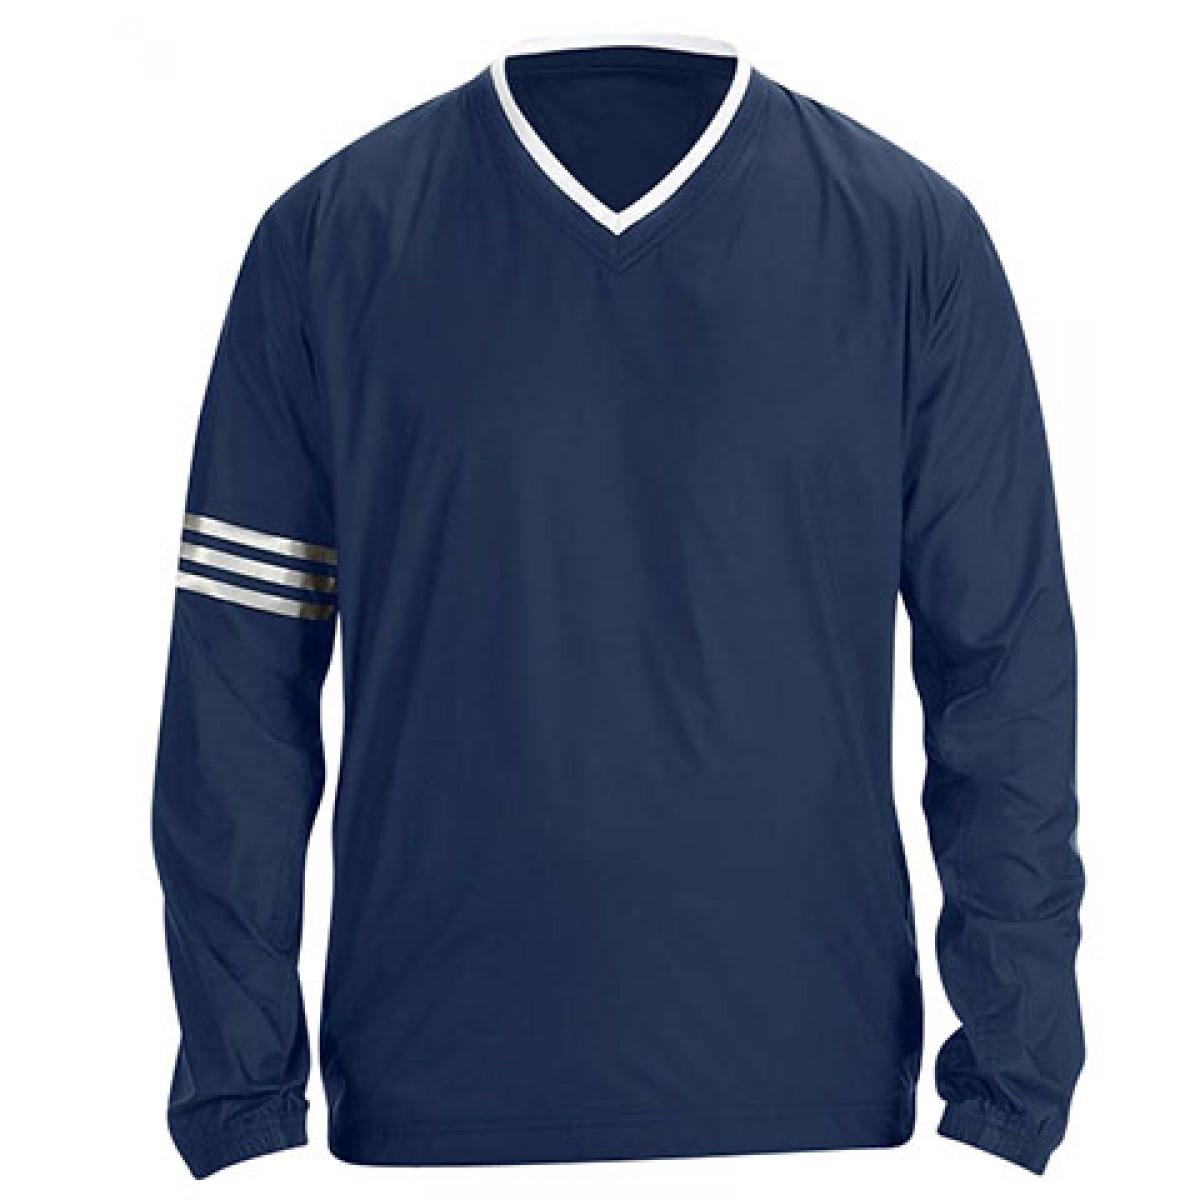 Adidas ClimaLite V-Neck Long Sleeve Wind Shirt-Navy-M